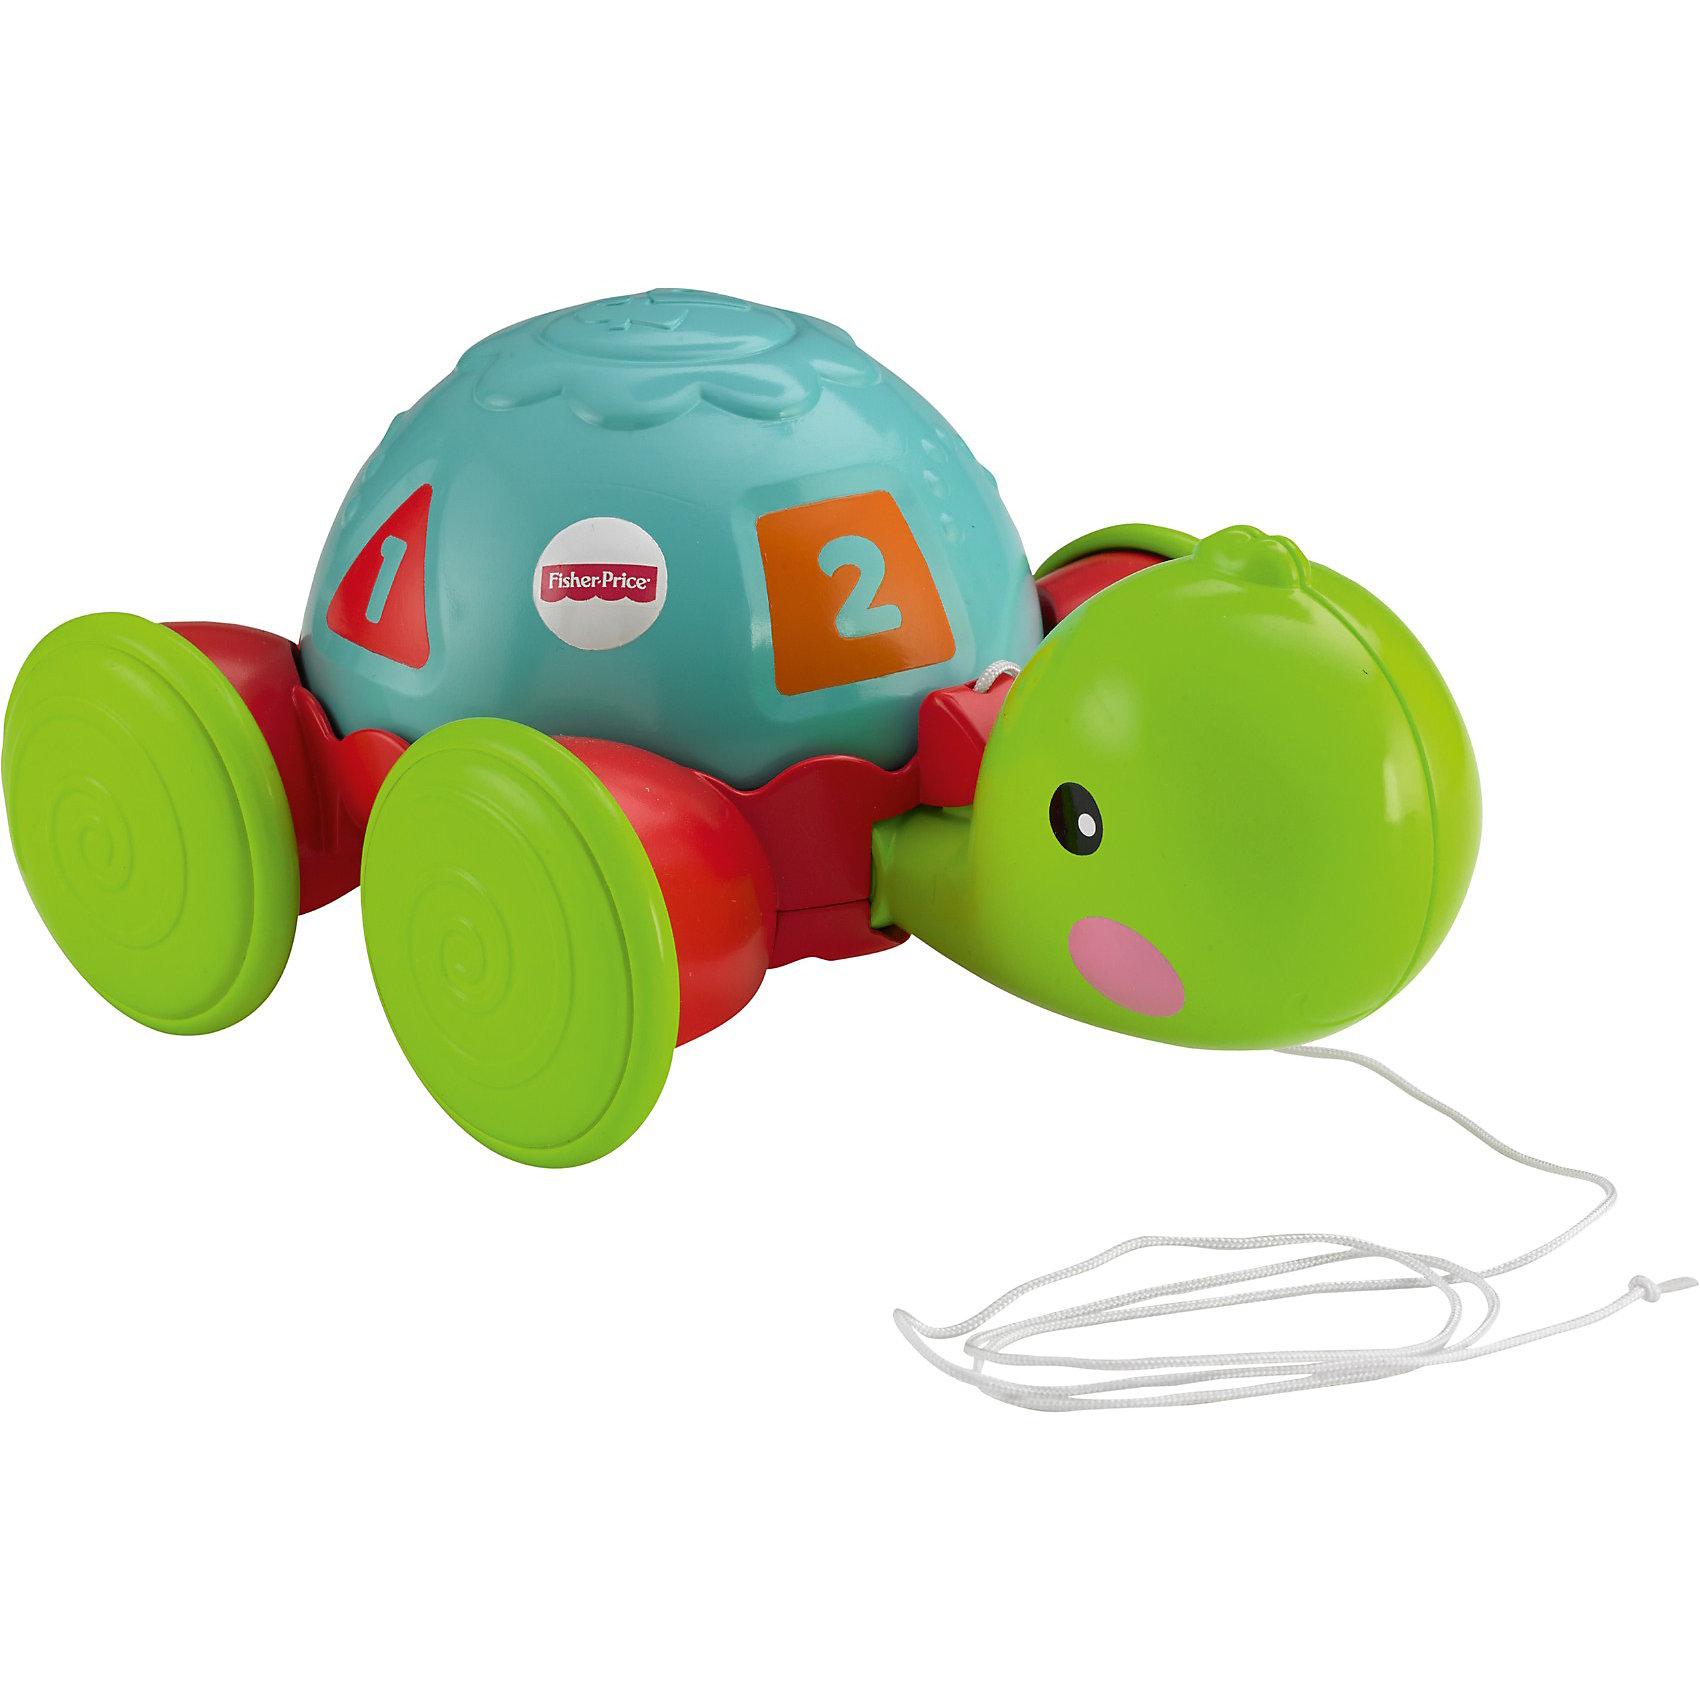 Mattel Каталка Обучающая черепашка на колесиках, Fisher-Price каталки fisherprice каталка обучающая черепашка на колесиках